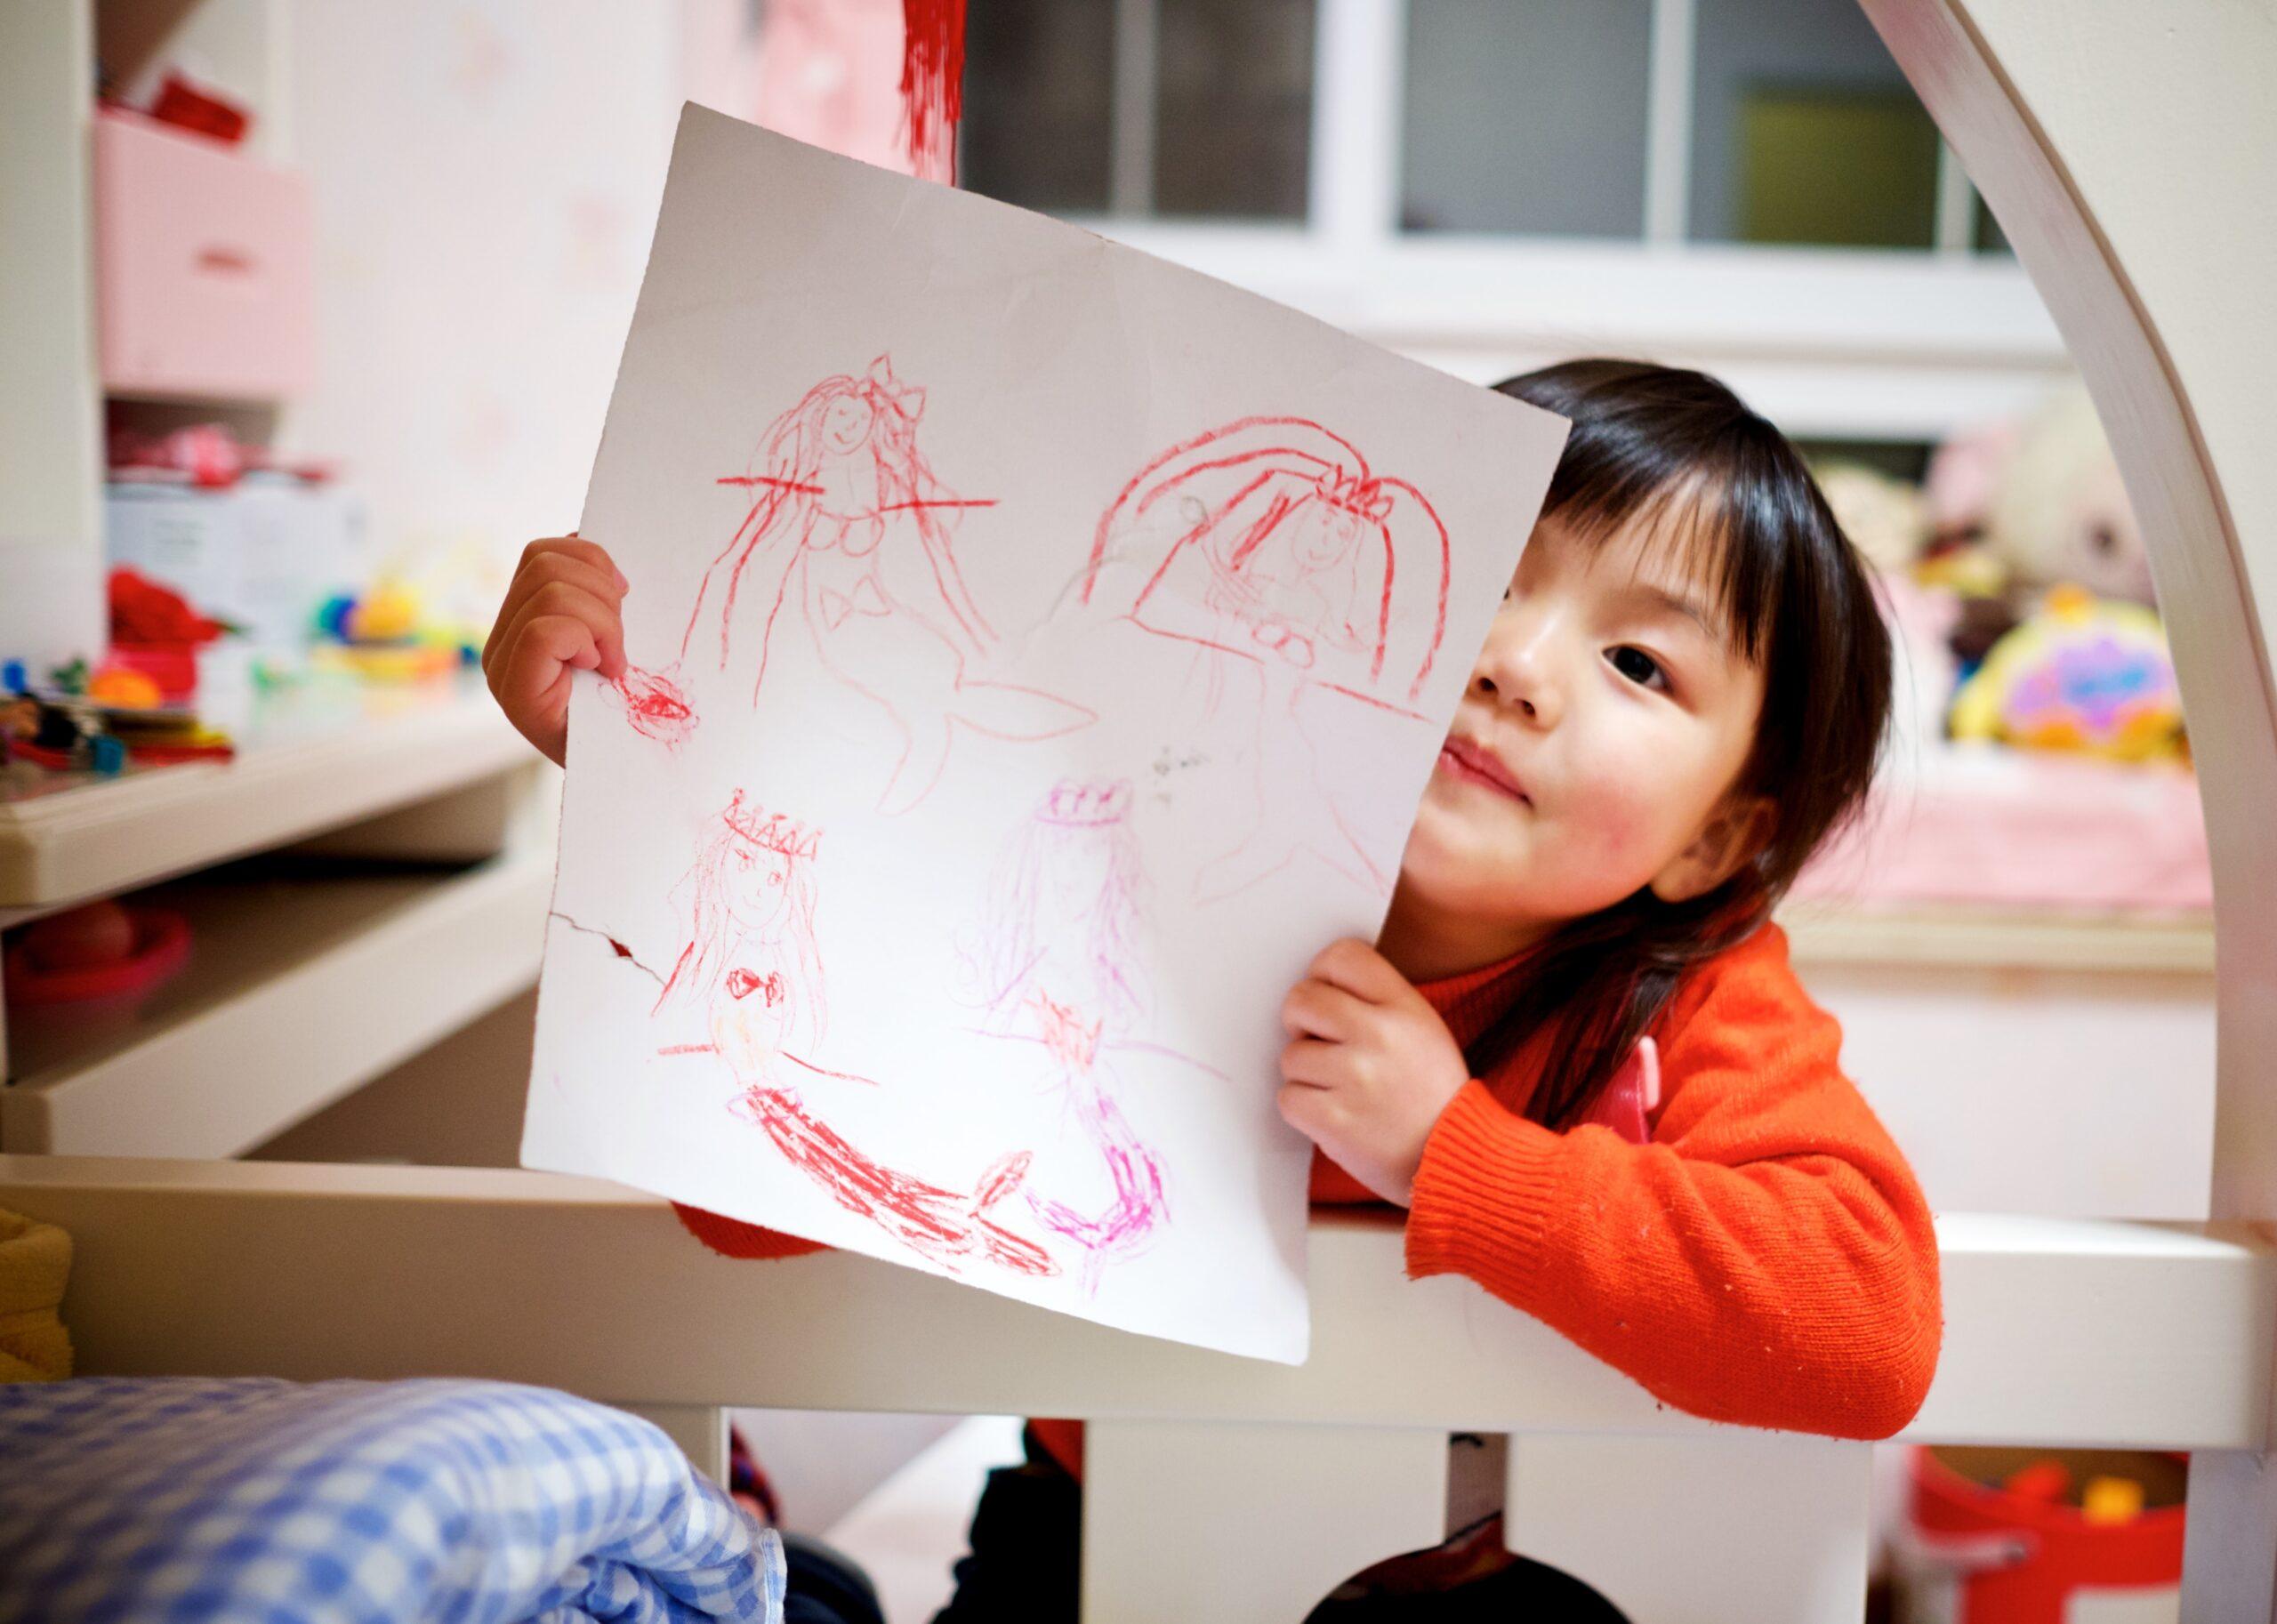 How to Develop Kids' Creativity?